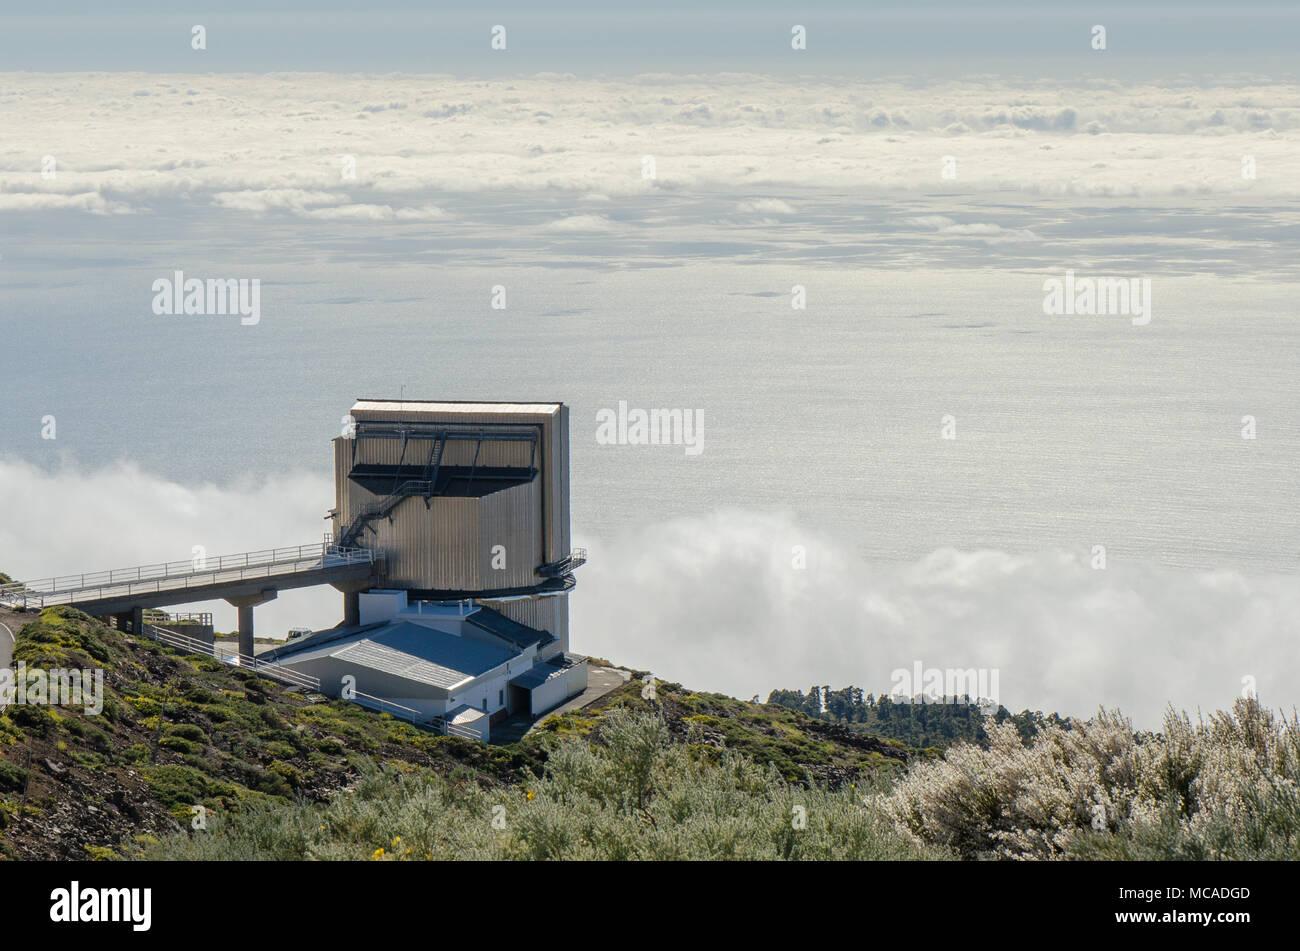 Galileo telescope stockfotos & galileo telescope bilder alamy